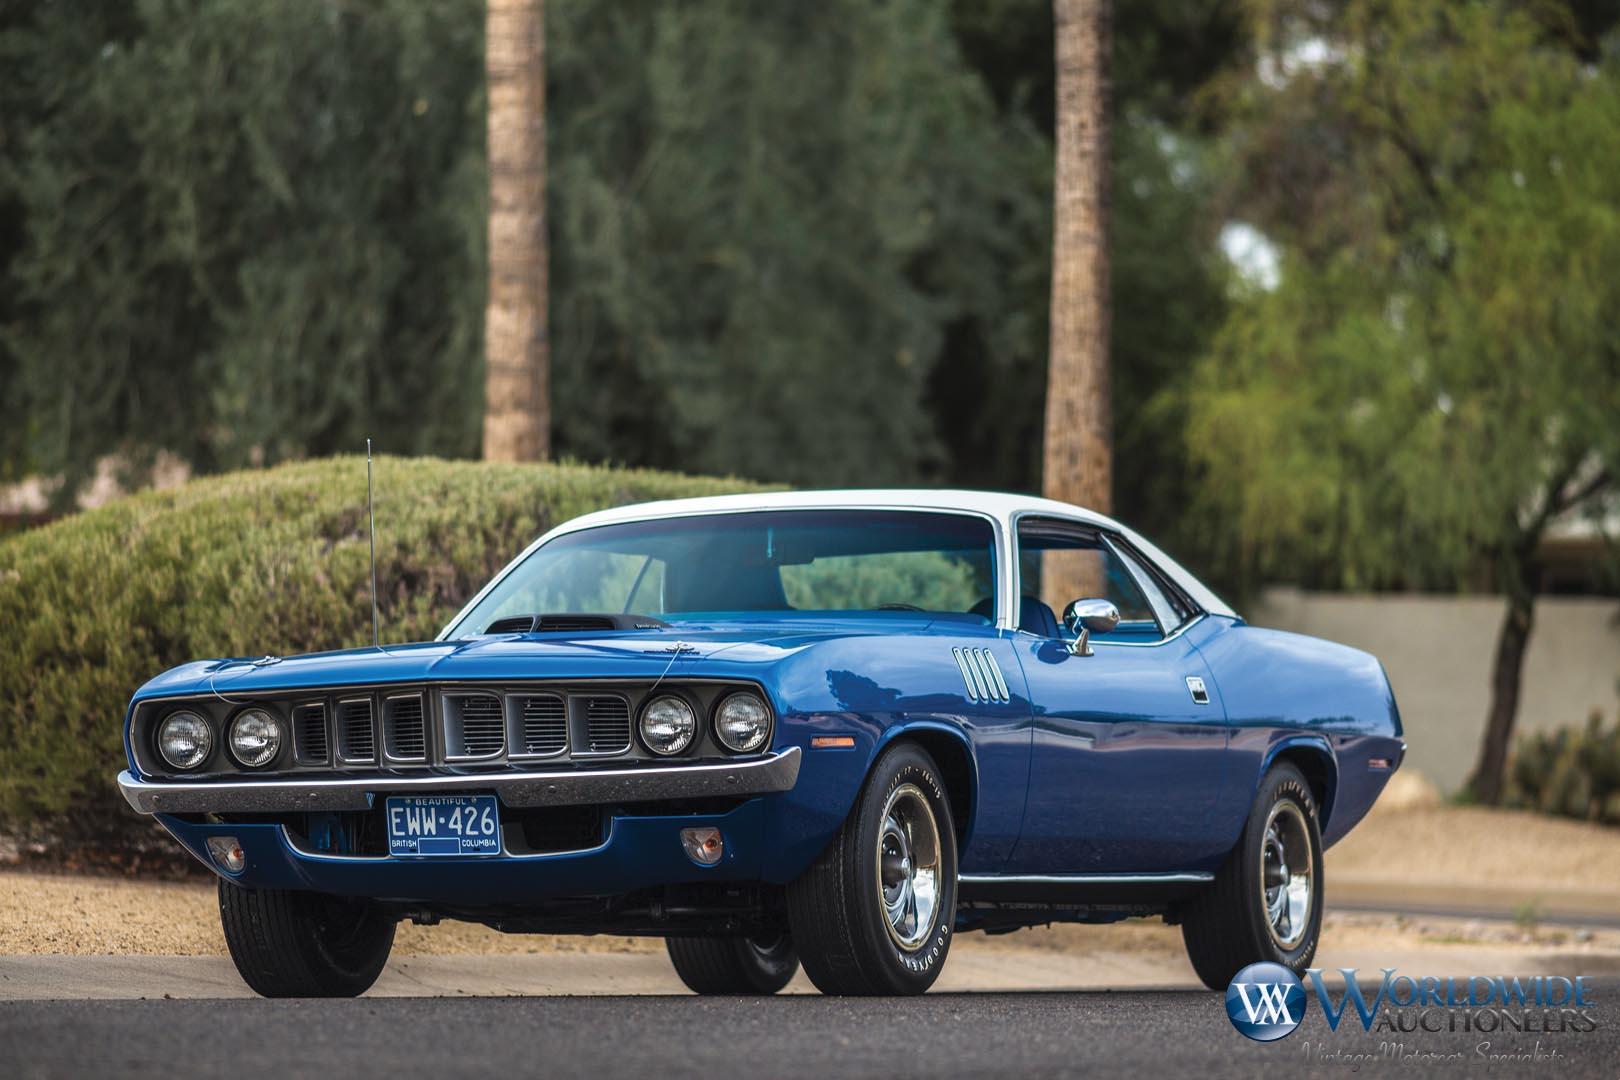 1971 Plymouth Hemi 'Cuda at Worldwide